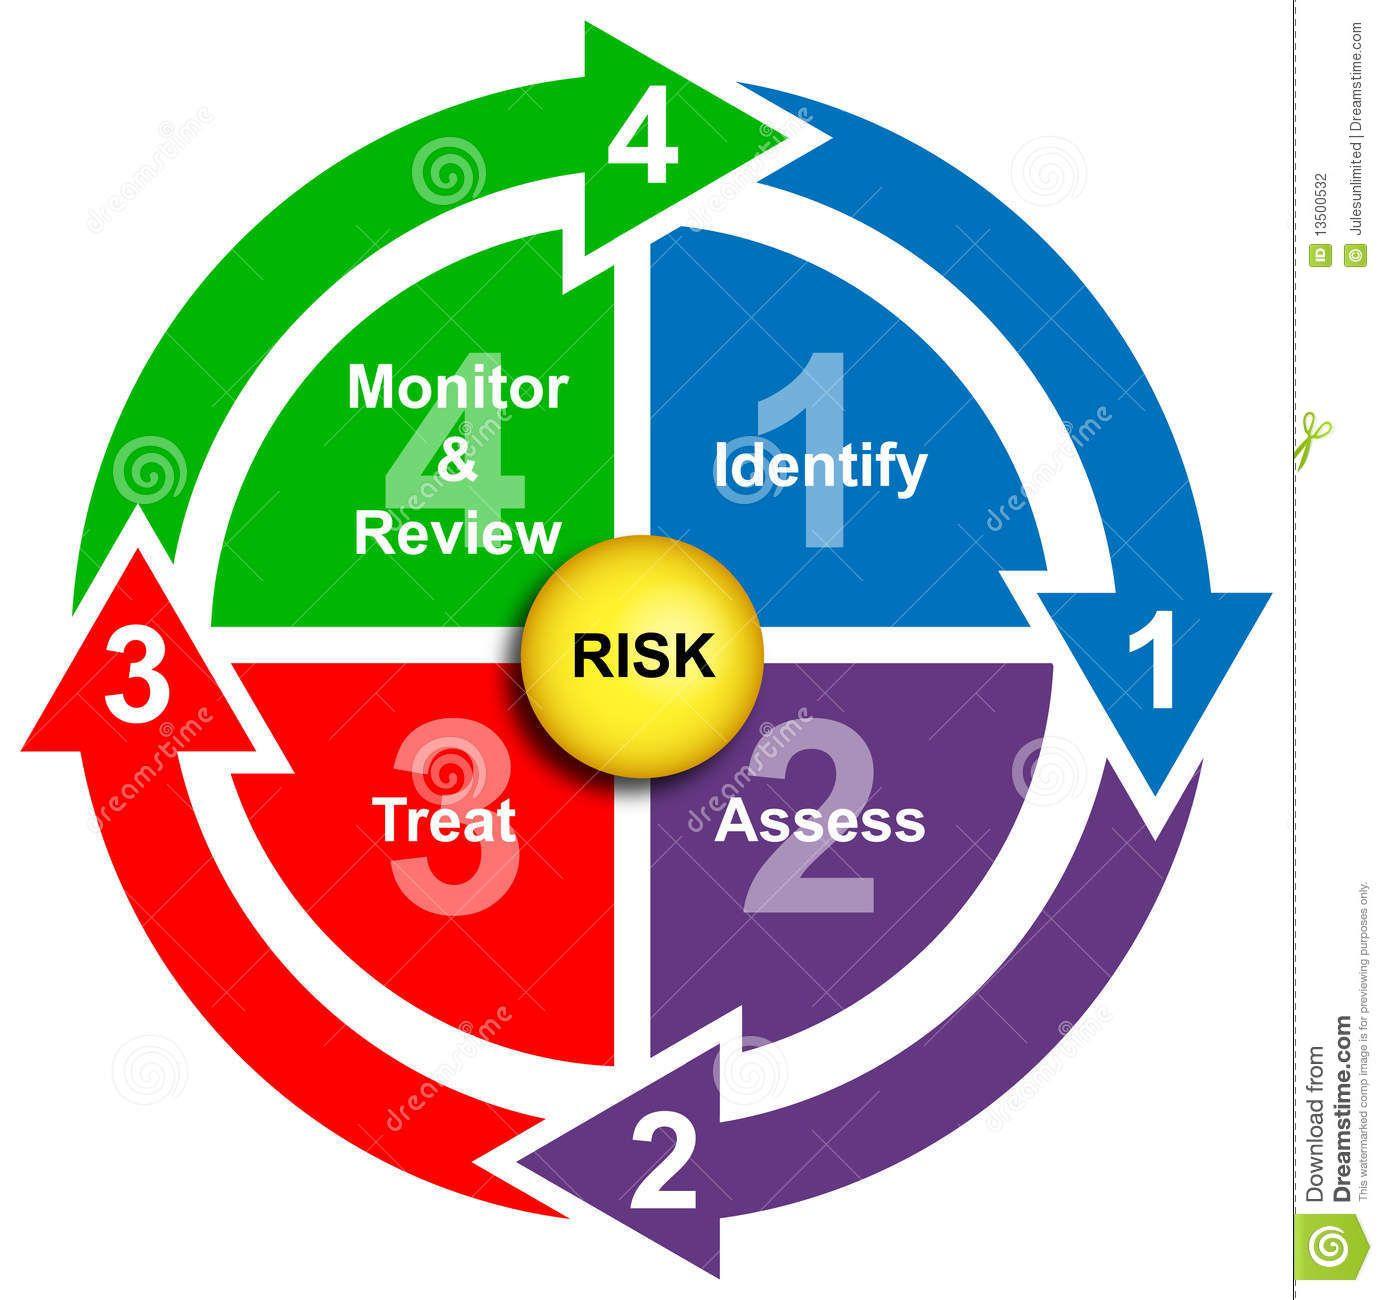 risk management diagram Google Search Risk management